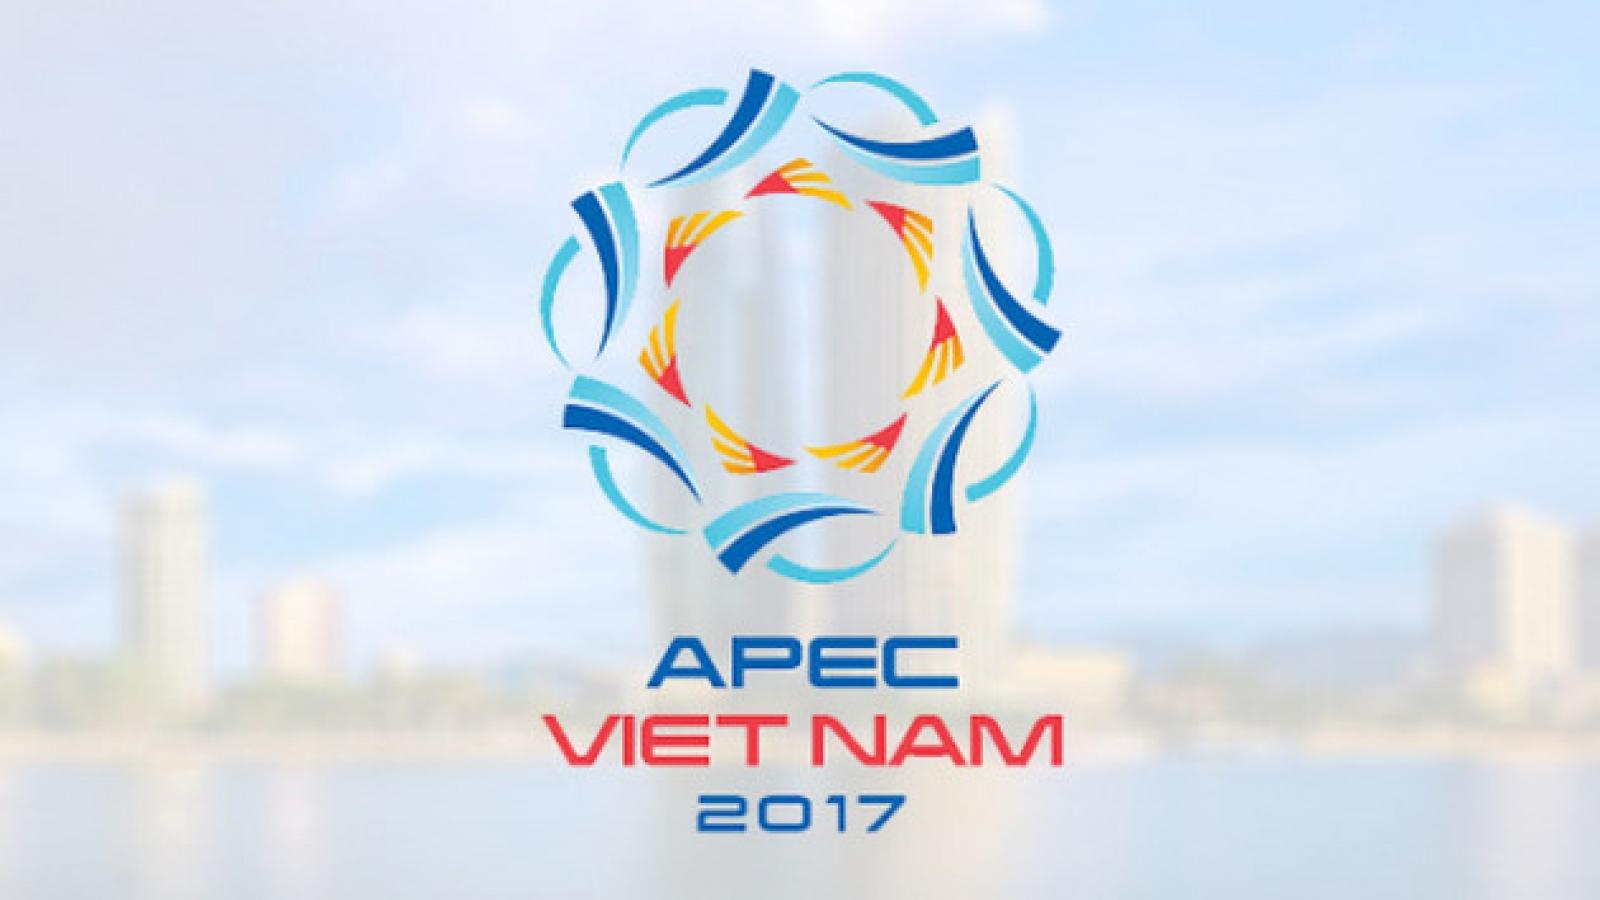 APEC grasps new trends, heads to sustainable development